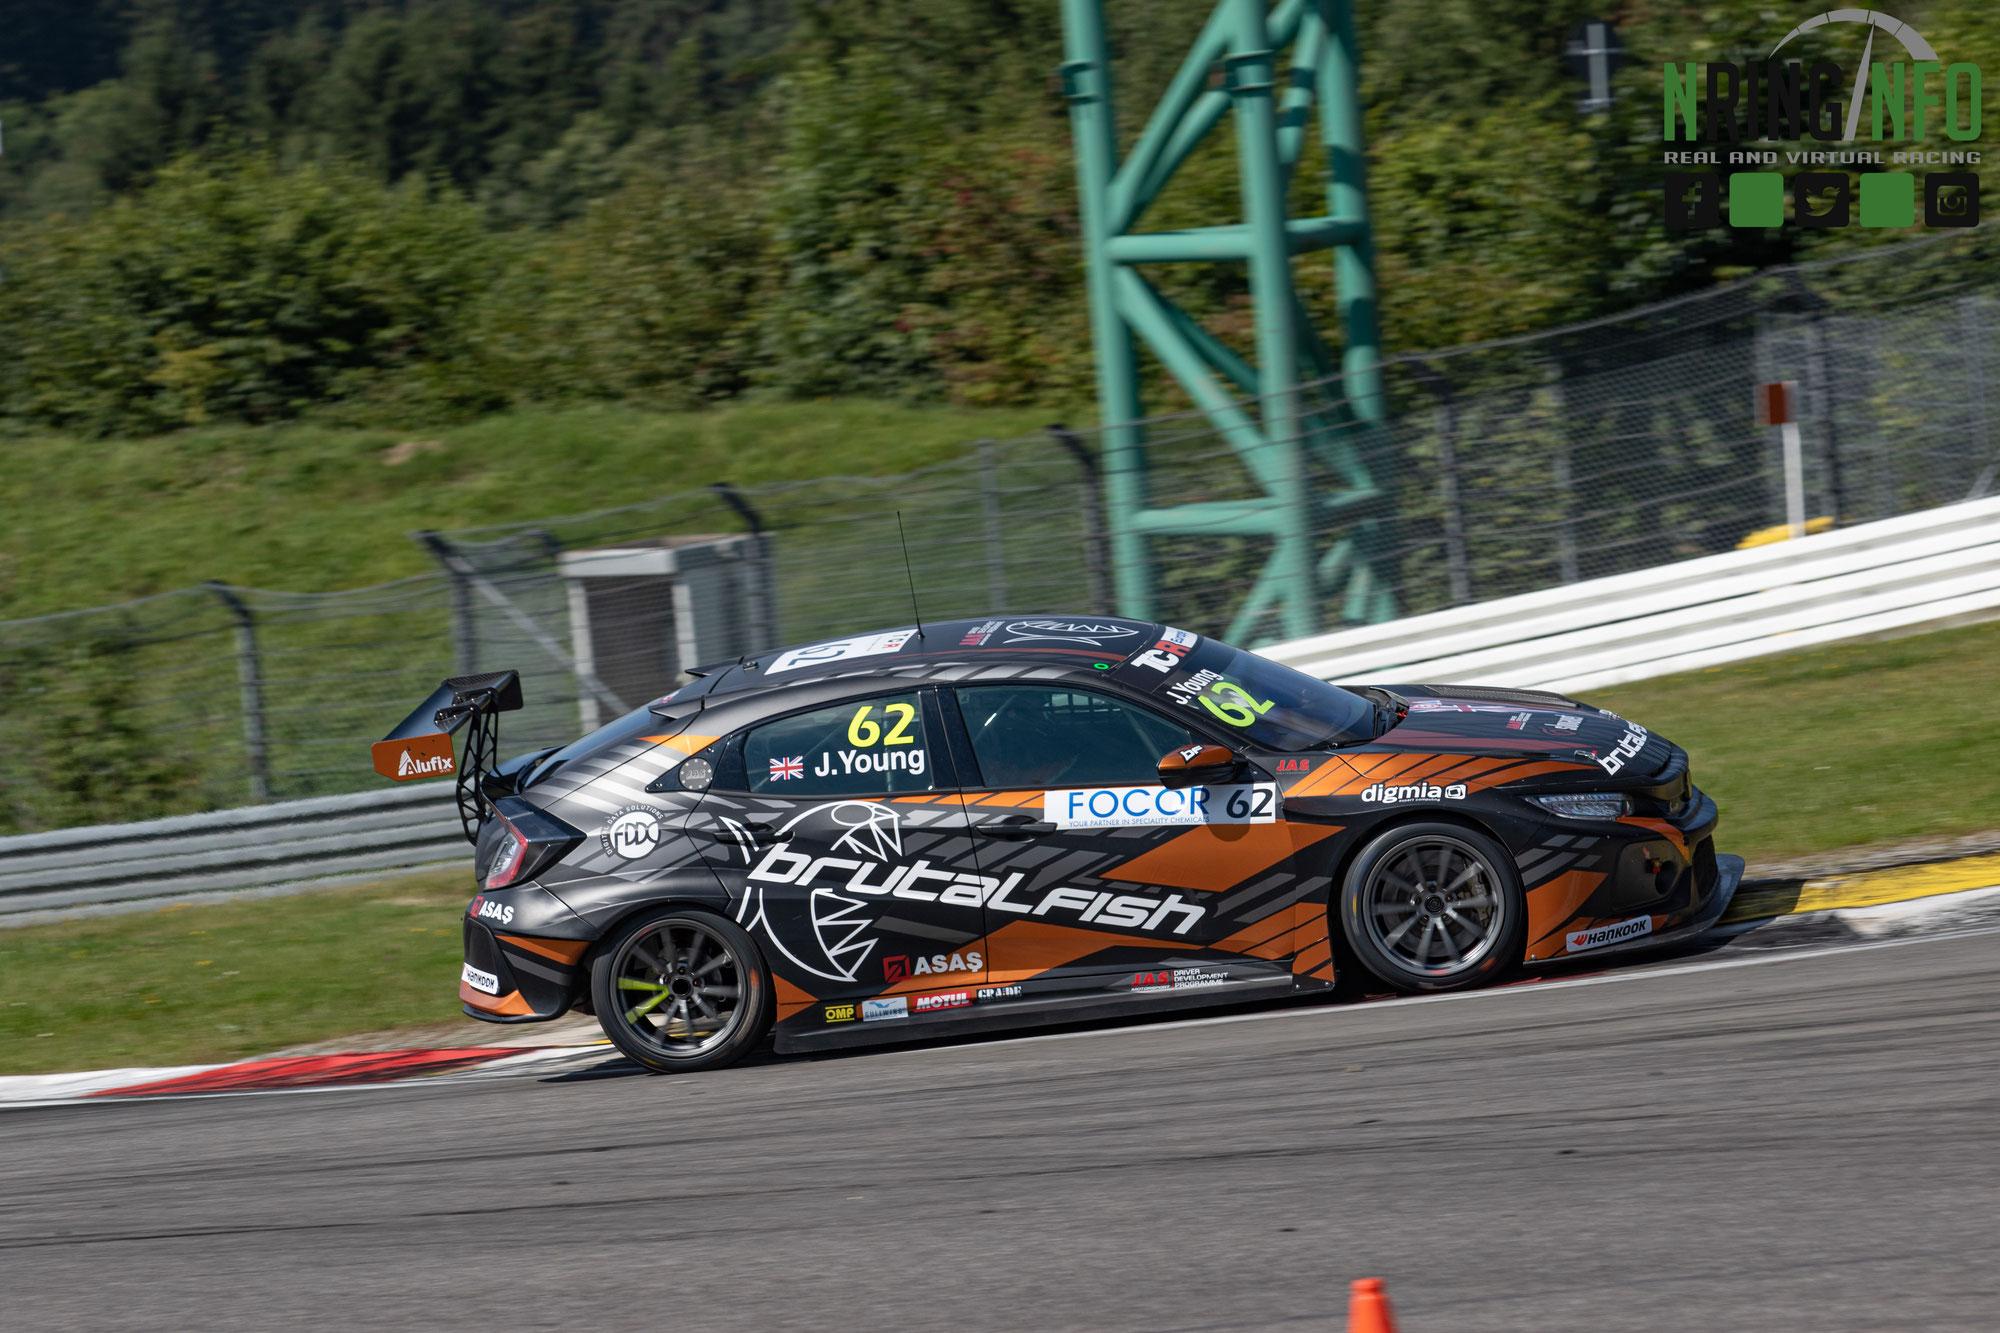 Sensationelles Podiumsergebnis auf dem Nürburgring für Jack Young